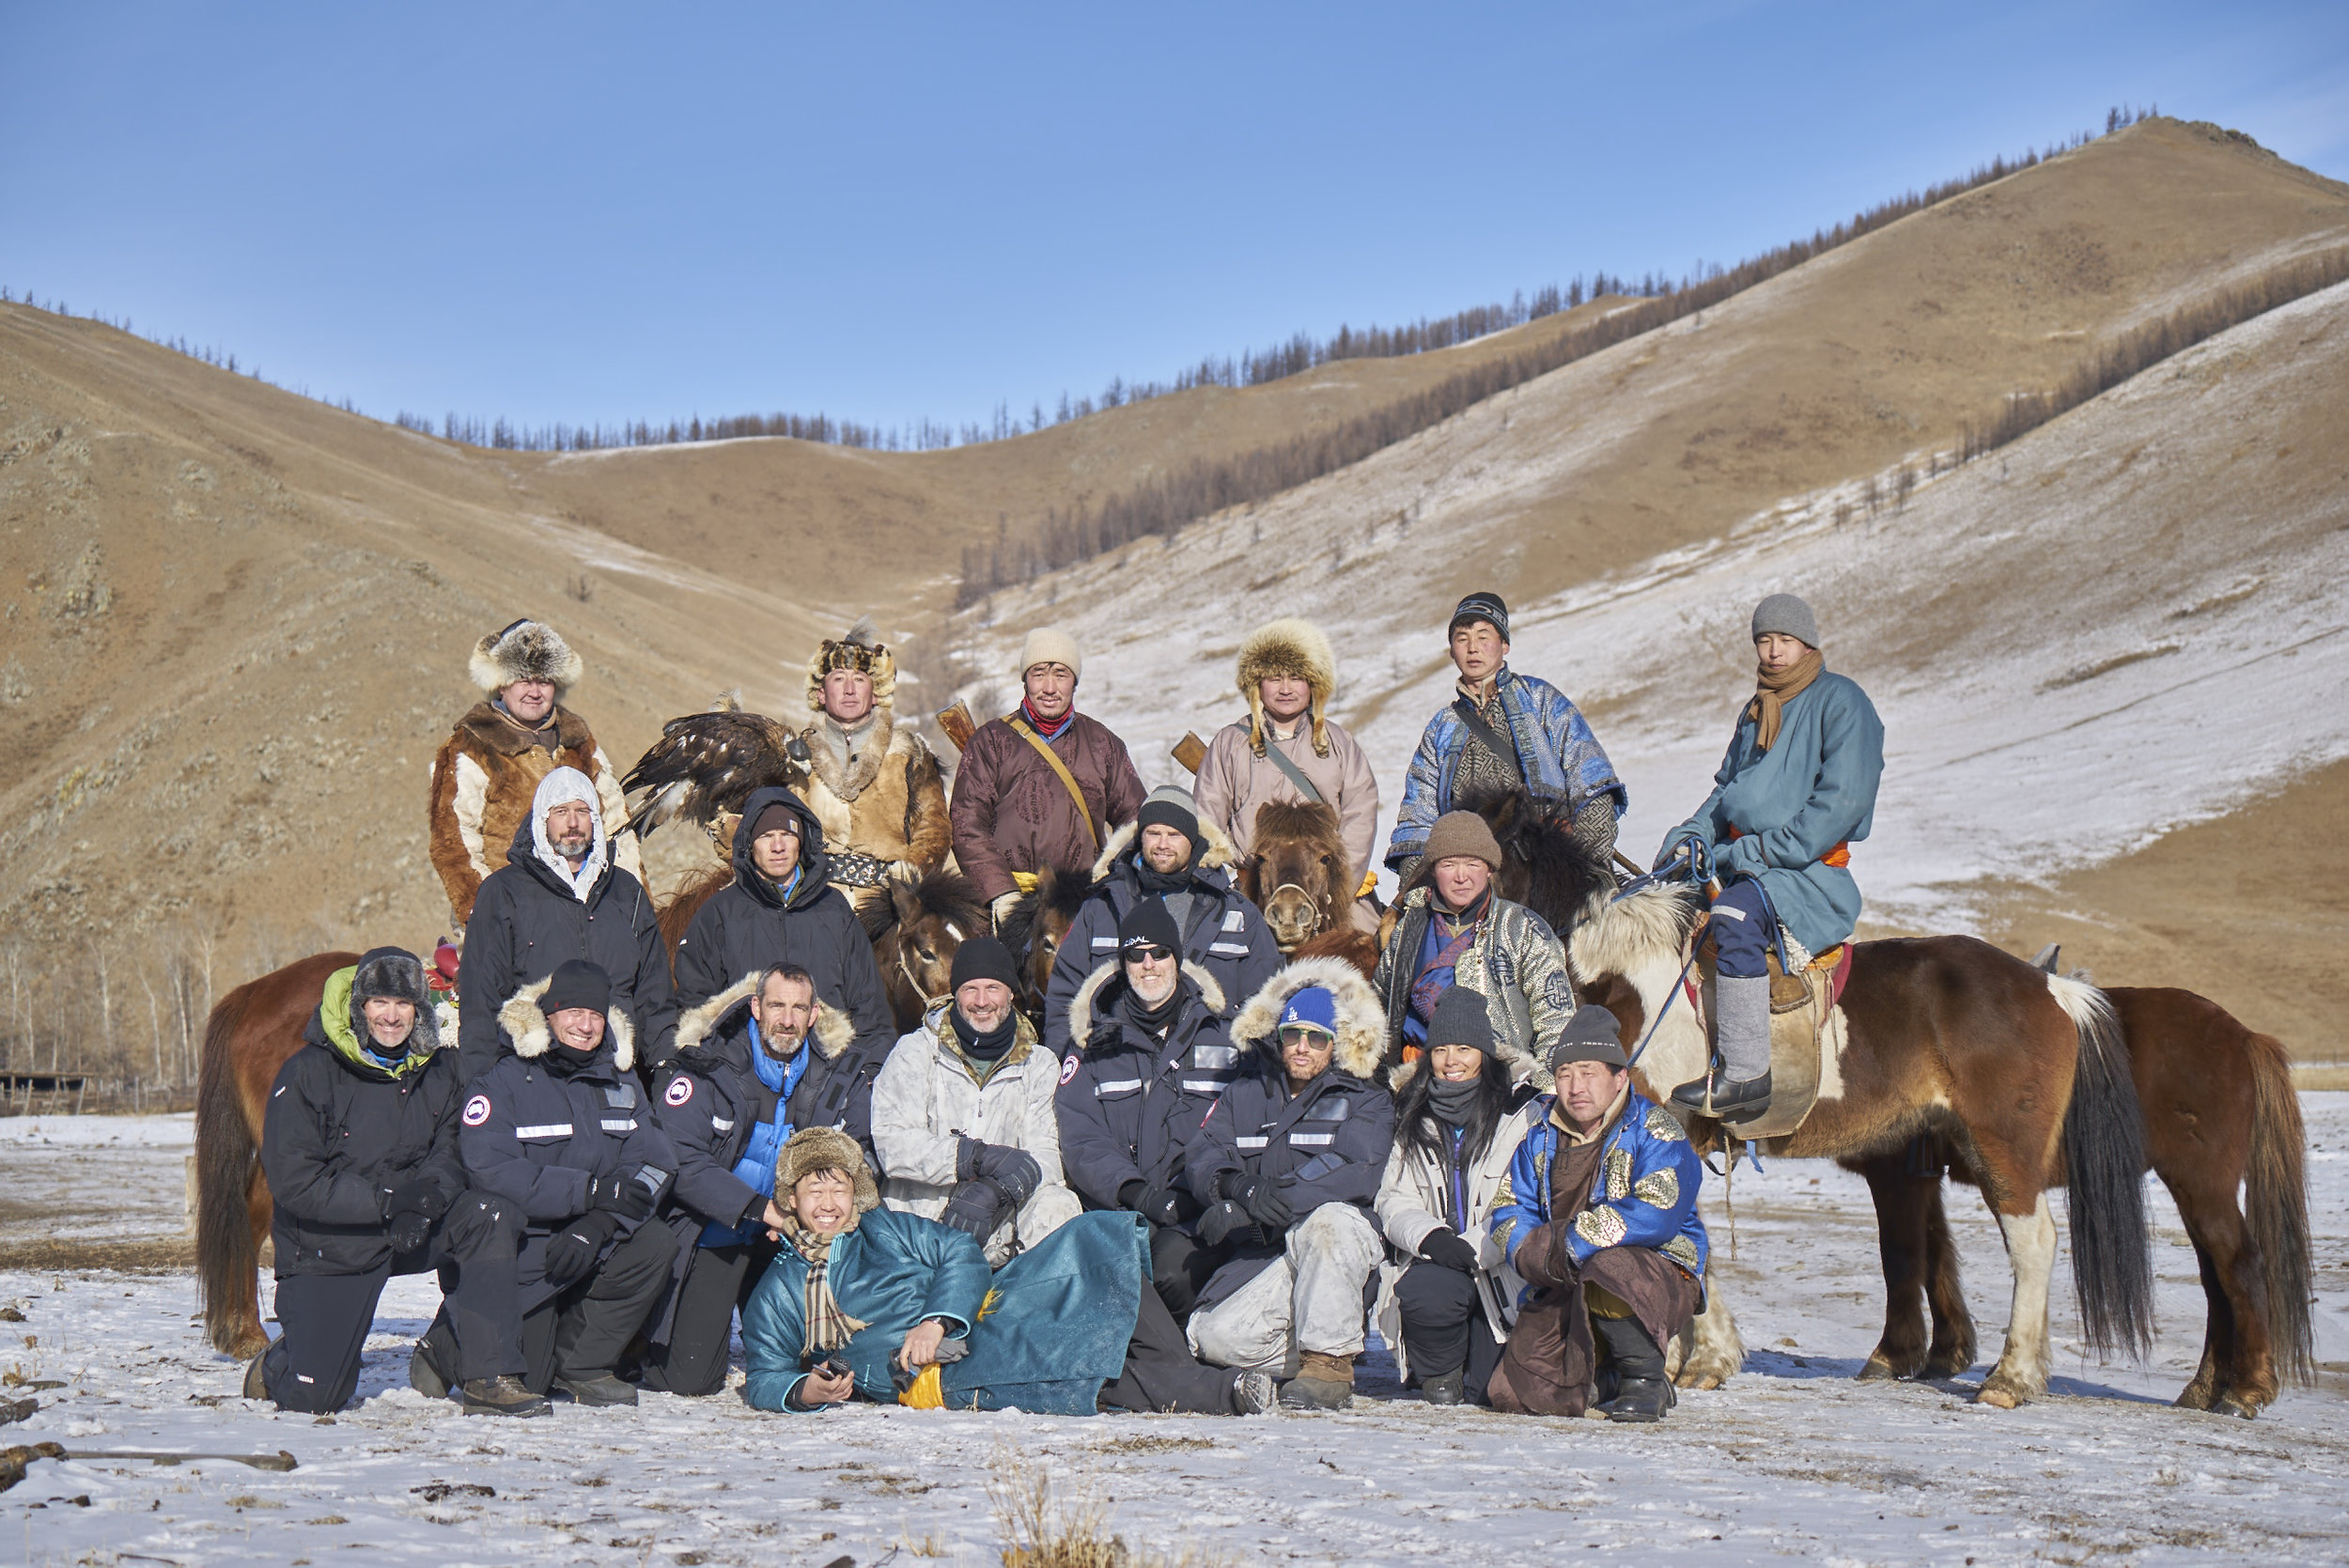 MONGOLIAN WINTER CLOTHES